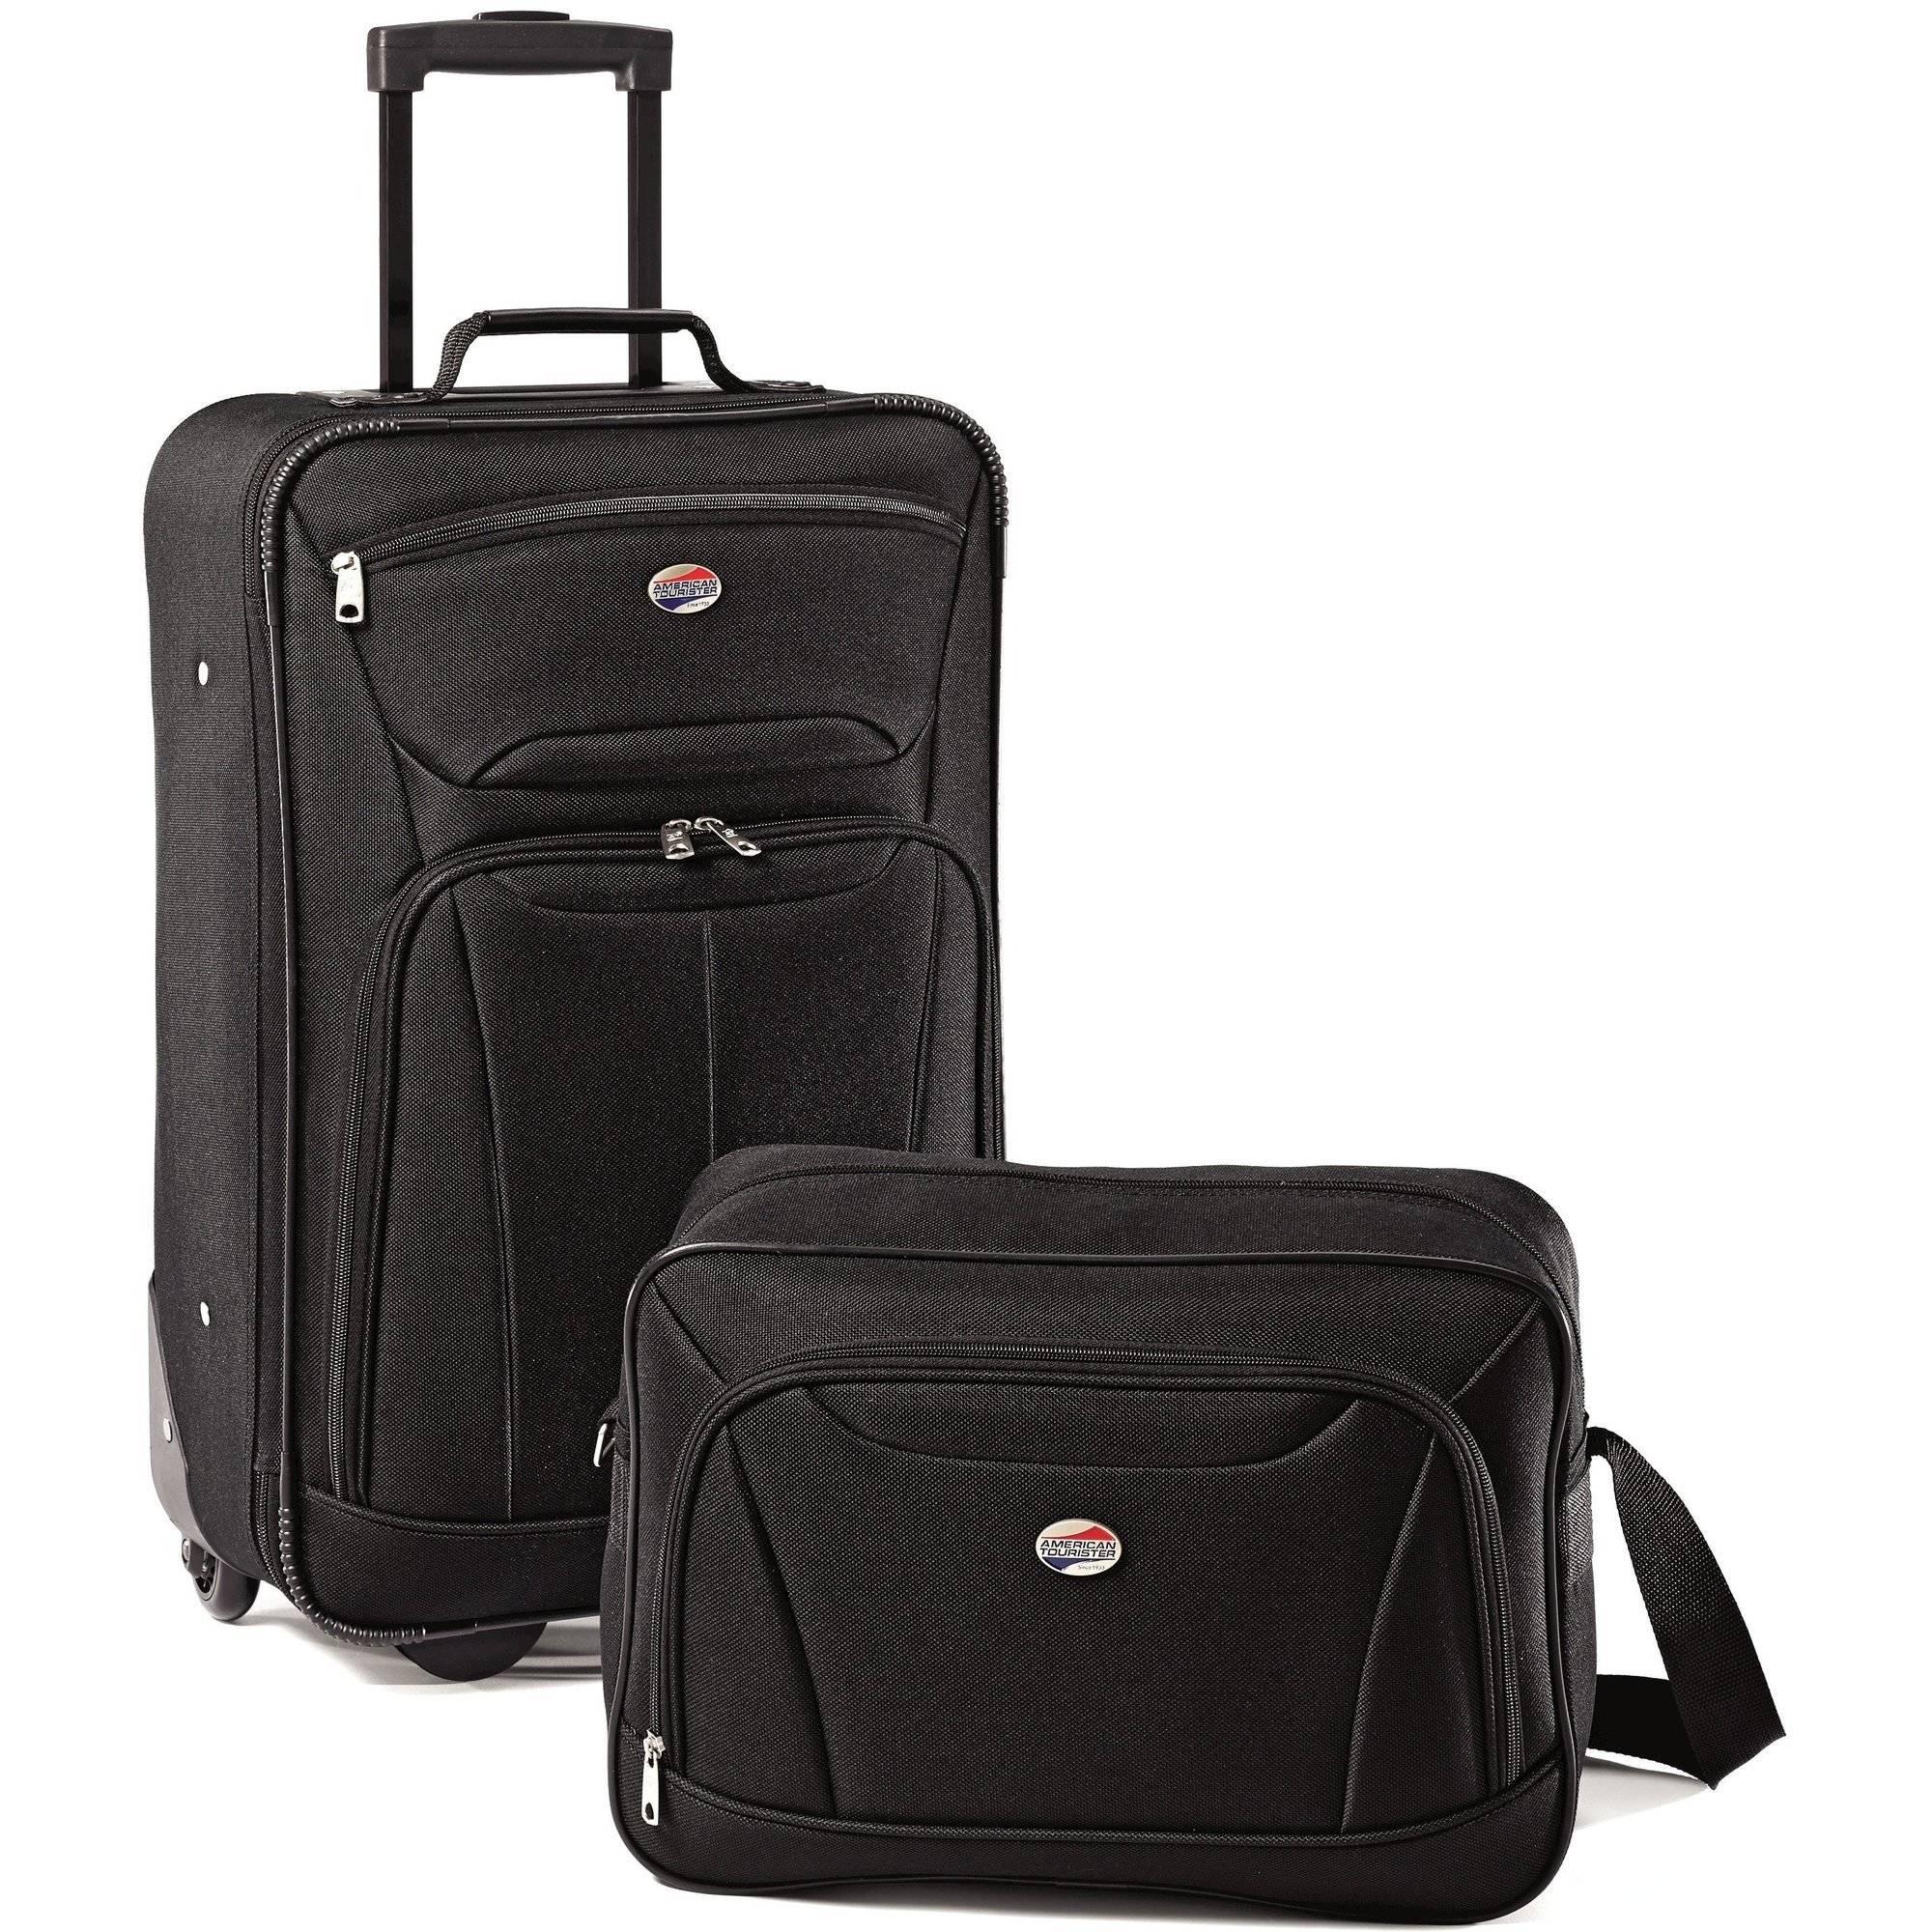 American Tourister Fieldbrook II 2-Piece Luggage Set $29 @ Walmart